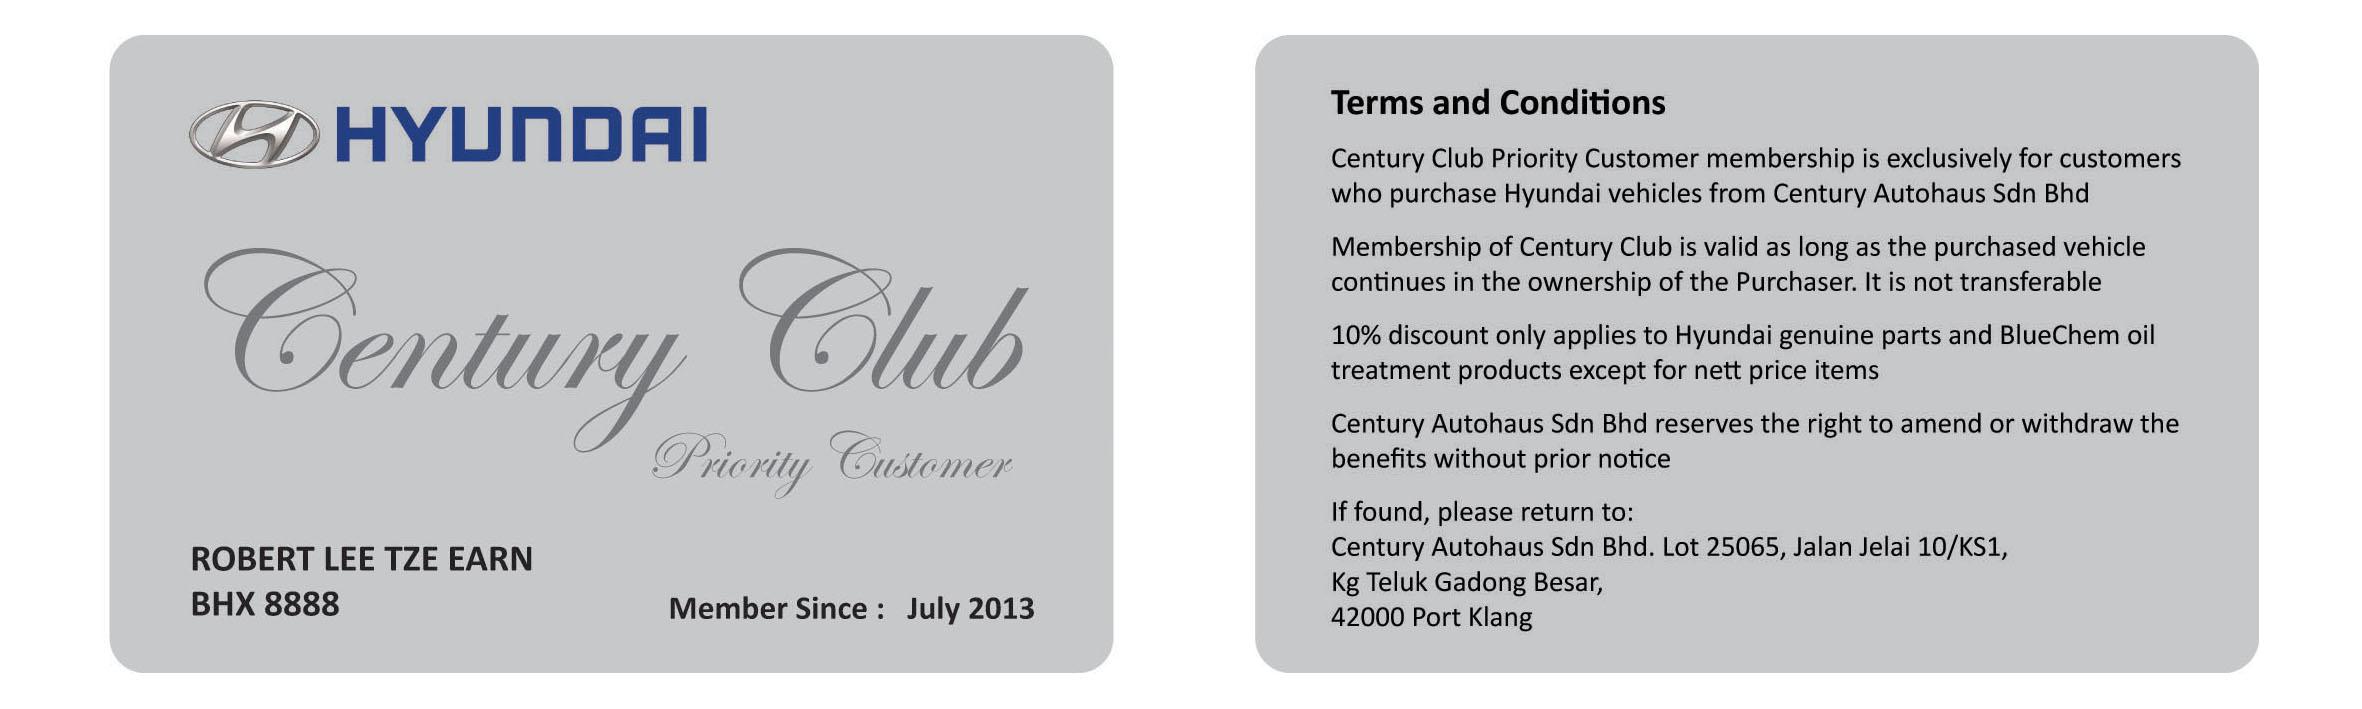 CENTURY CLUB PRIORITY CUSTOMER CARD